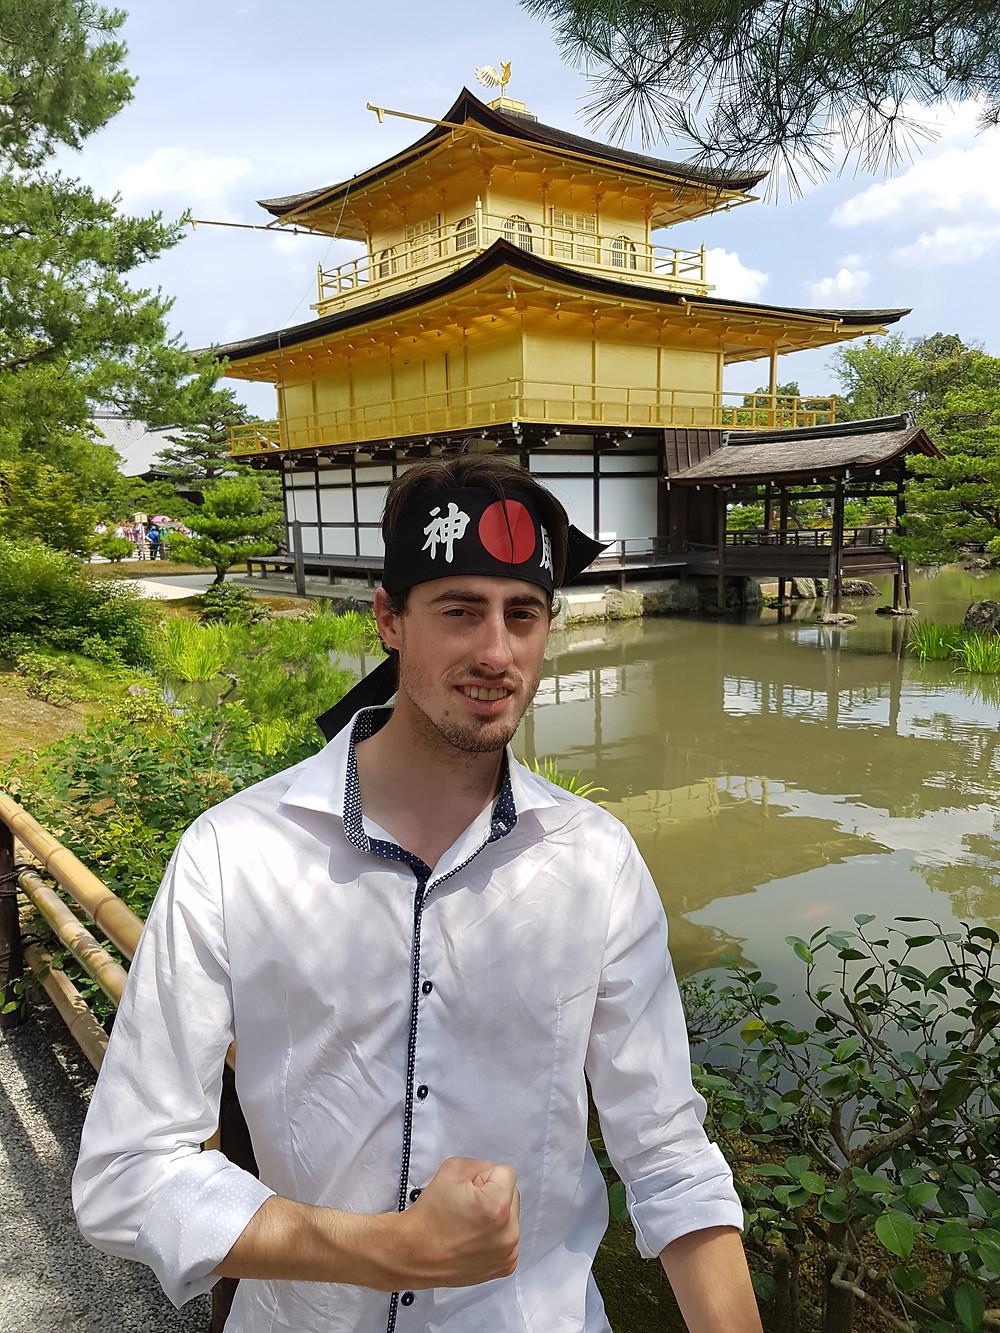 Nahaufnahme des Kinkakuji Tempel und ich in Pose mit Ninja-Kopfband